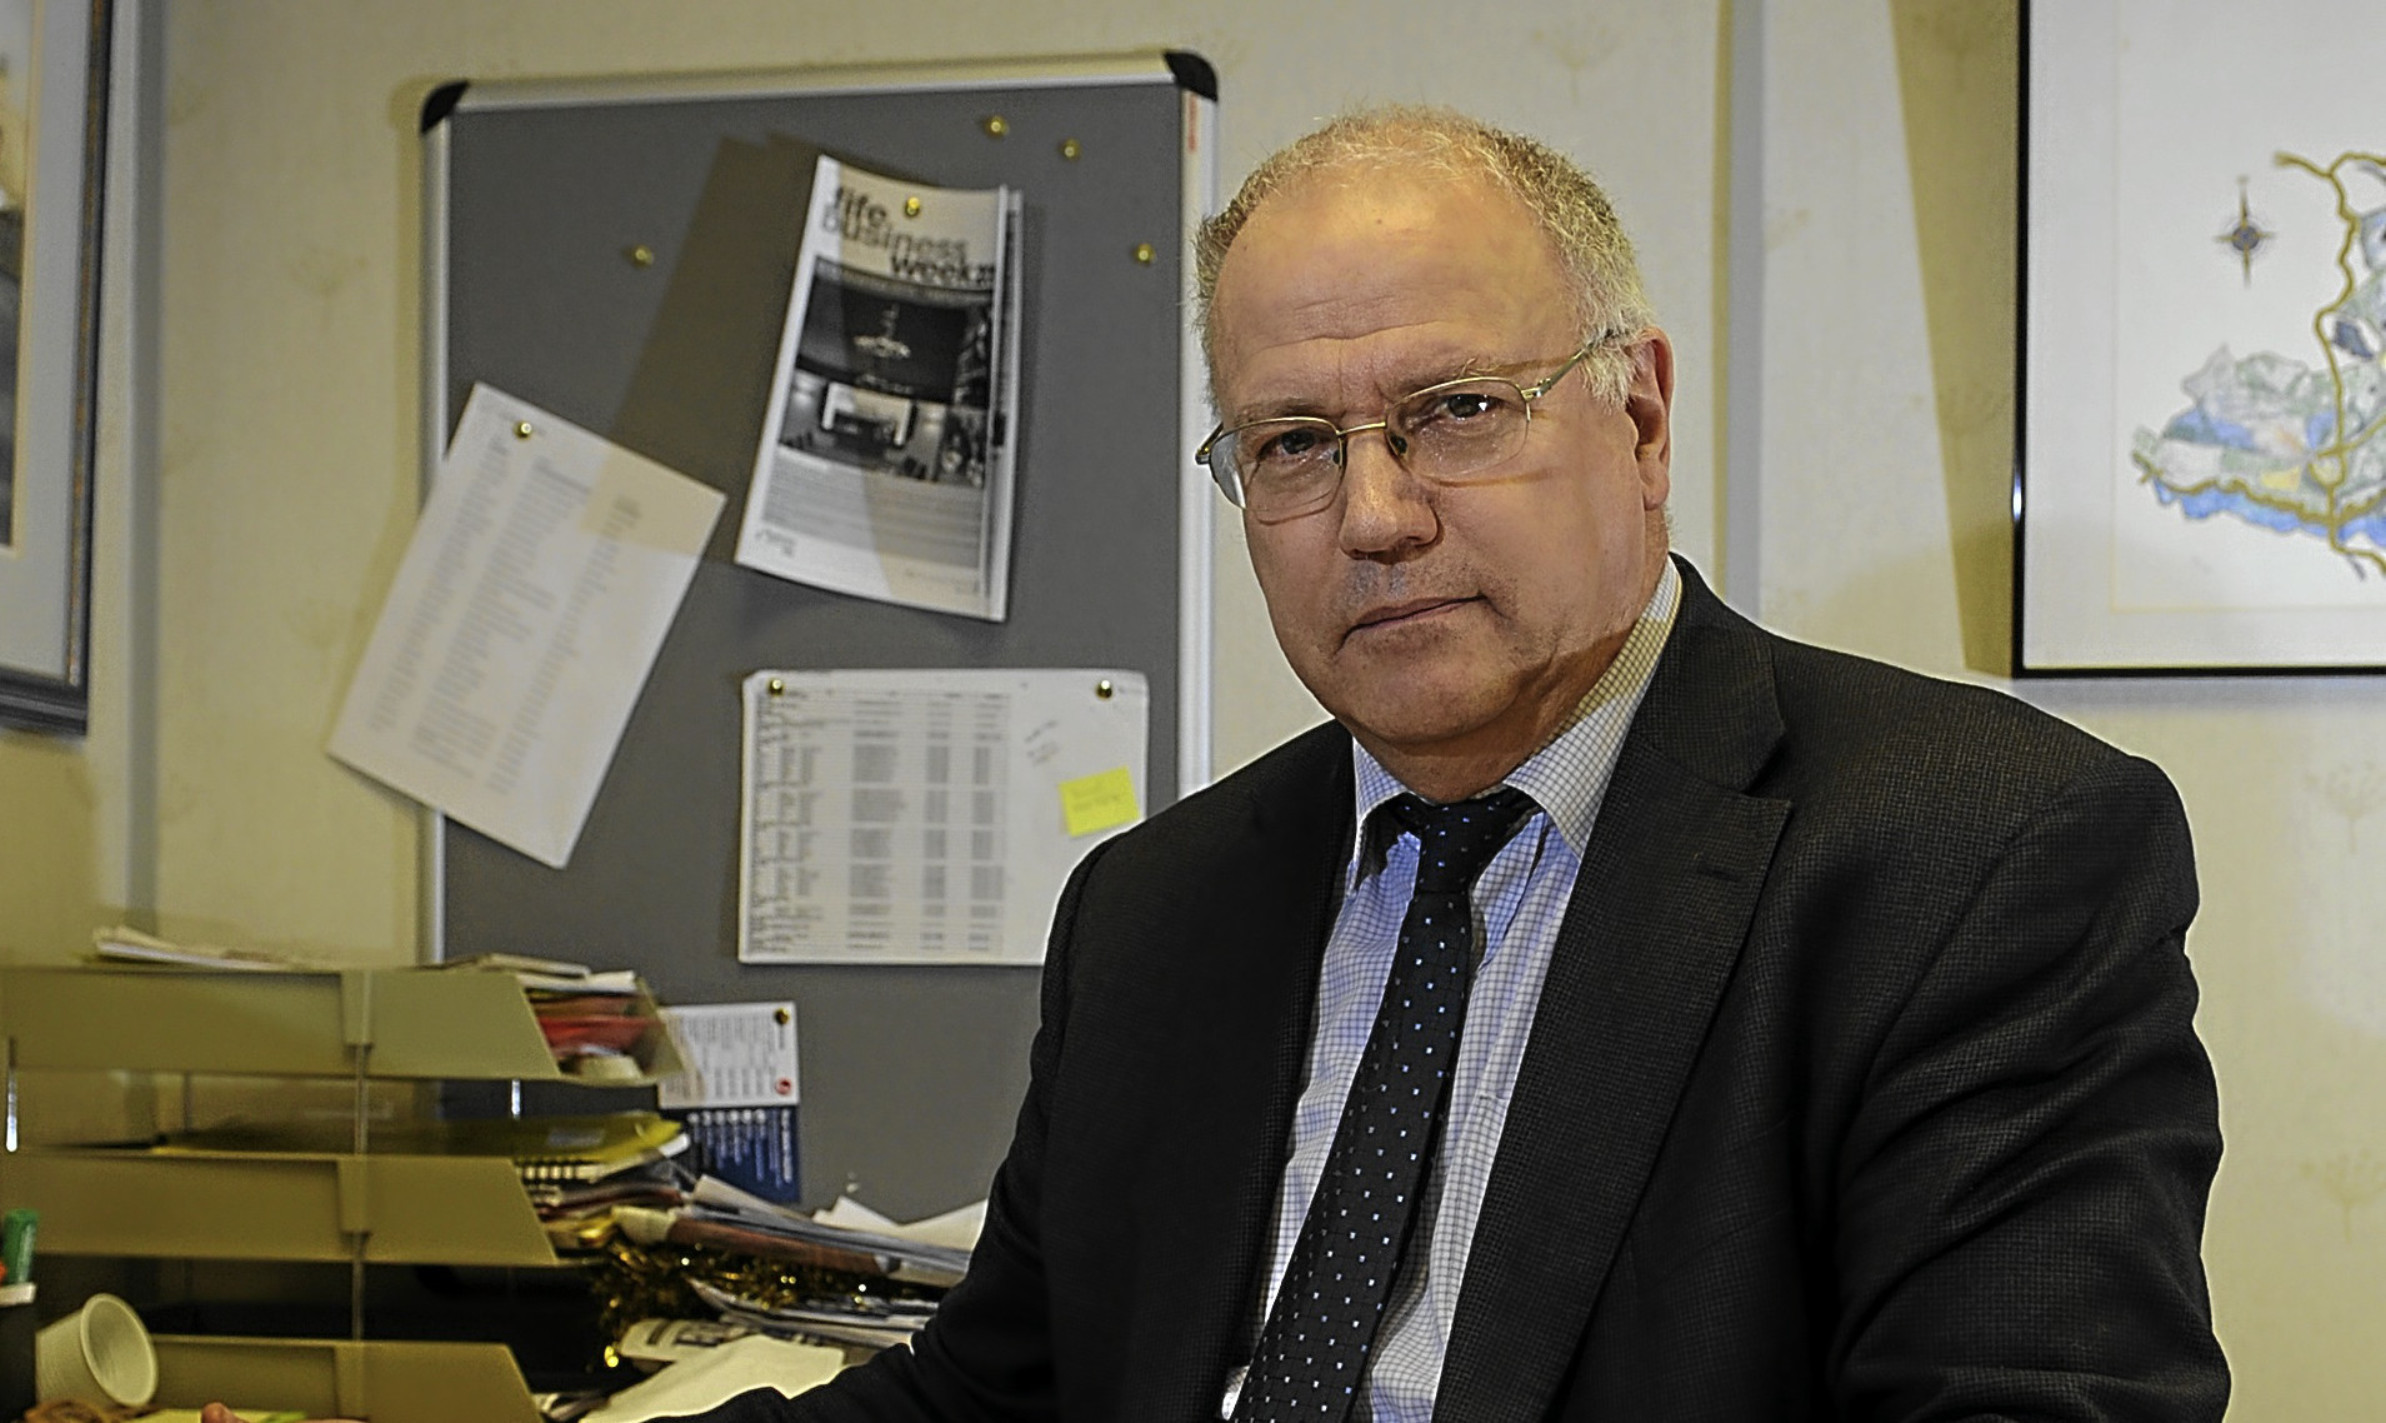 Fife Council leader David Ross.